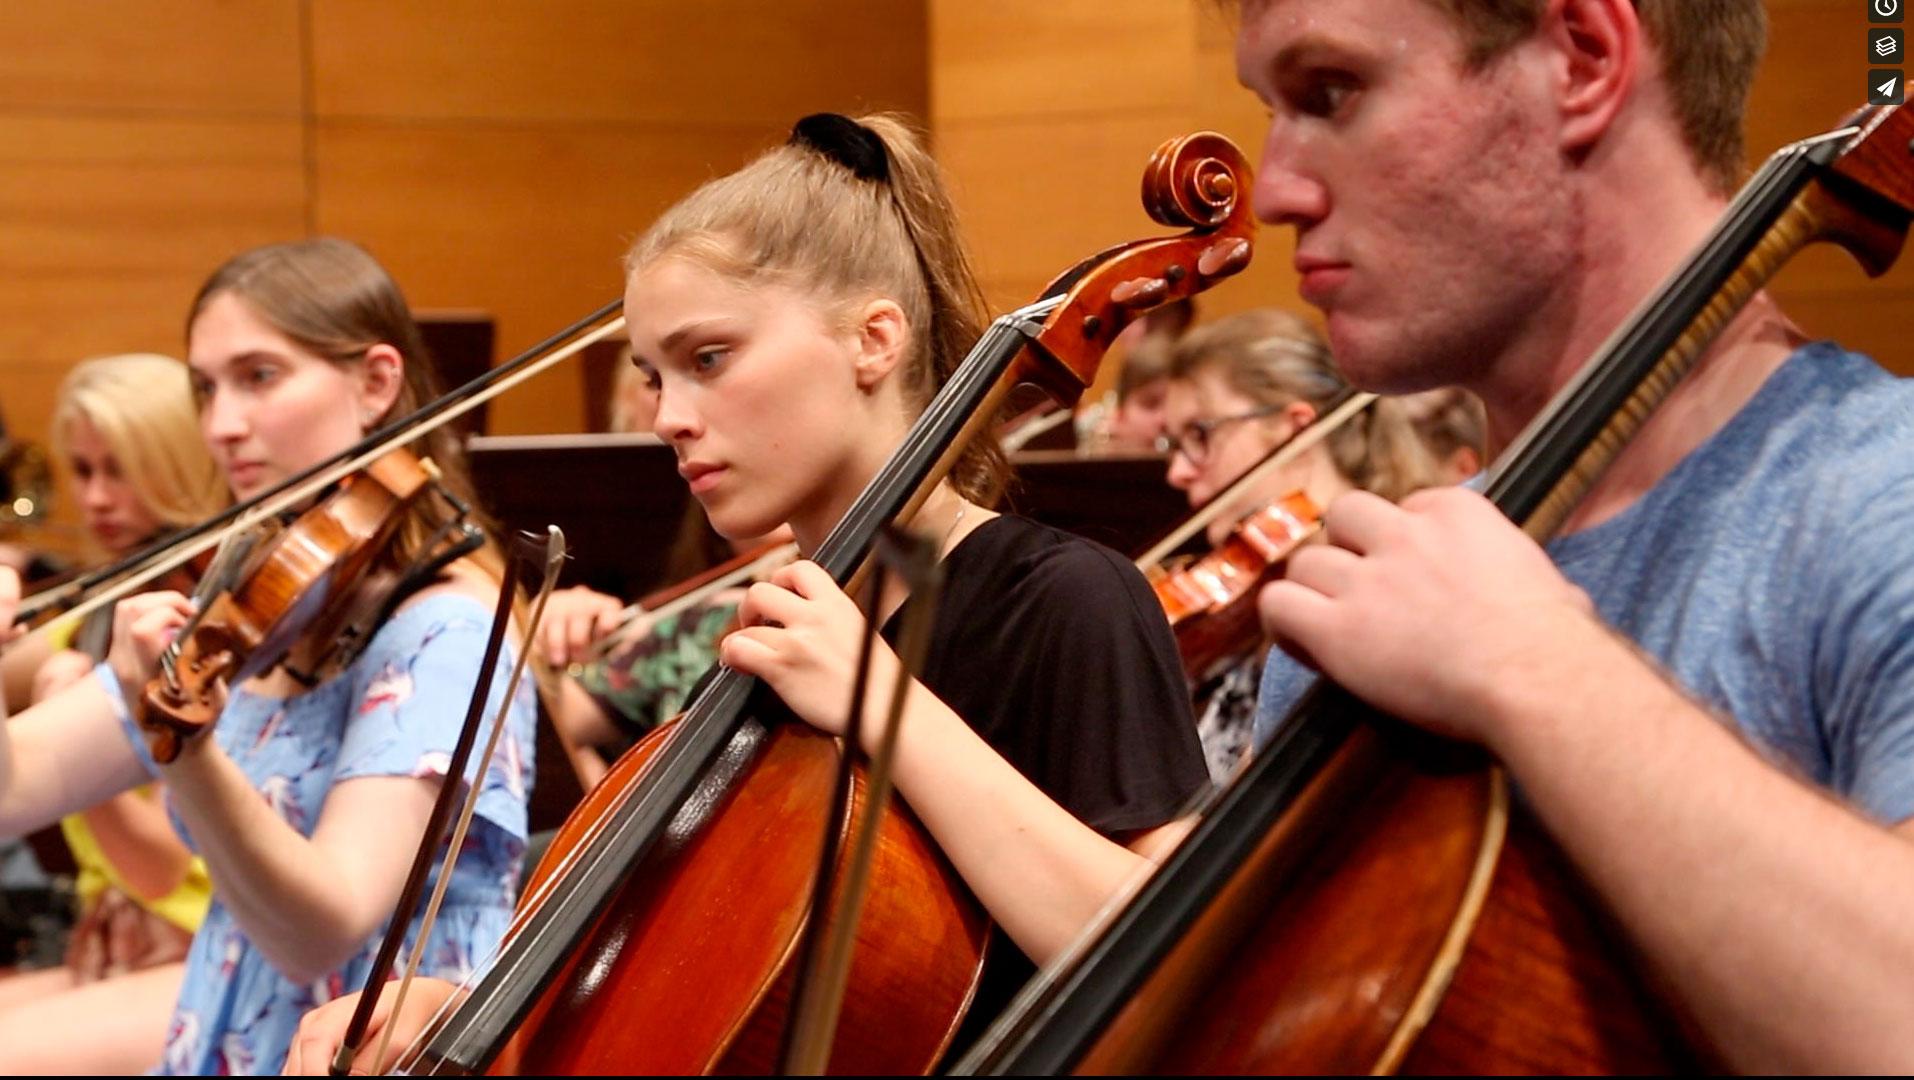 [nmzMedia-Video] YARO - Die Young Academy Rostock 2019